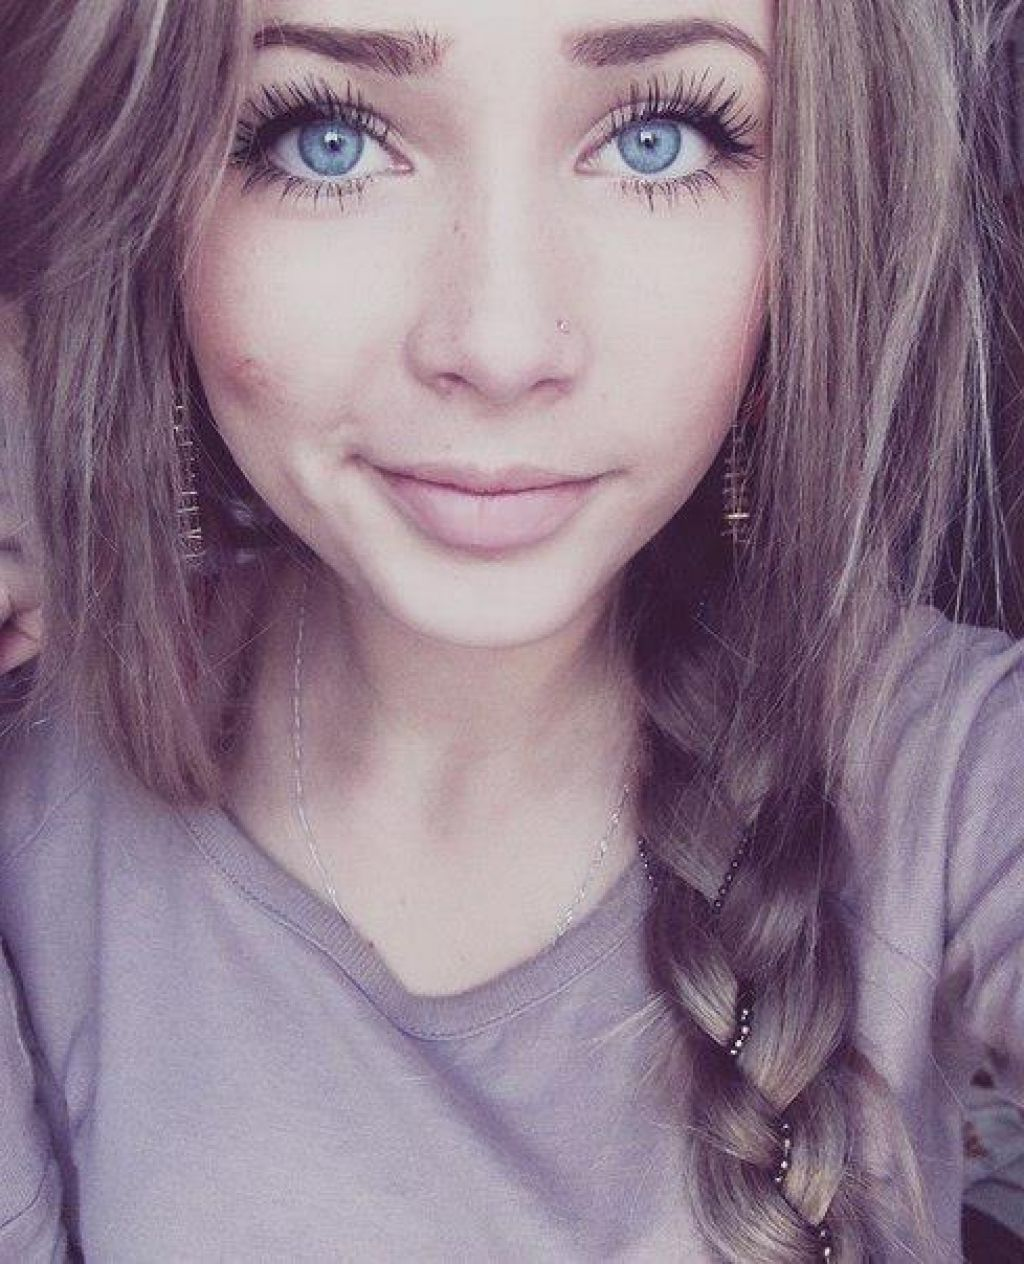 Natural Make Up Blonde Hair Girl 2015 Hairstyles